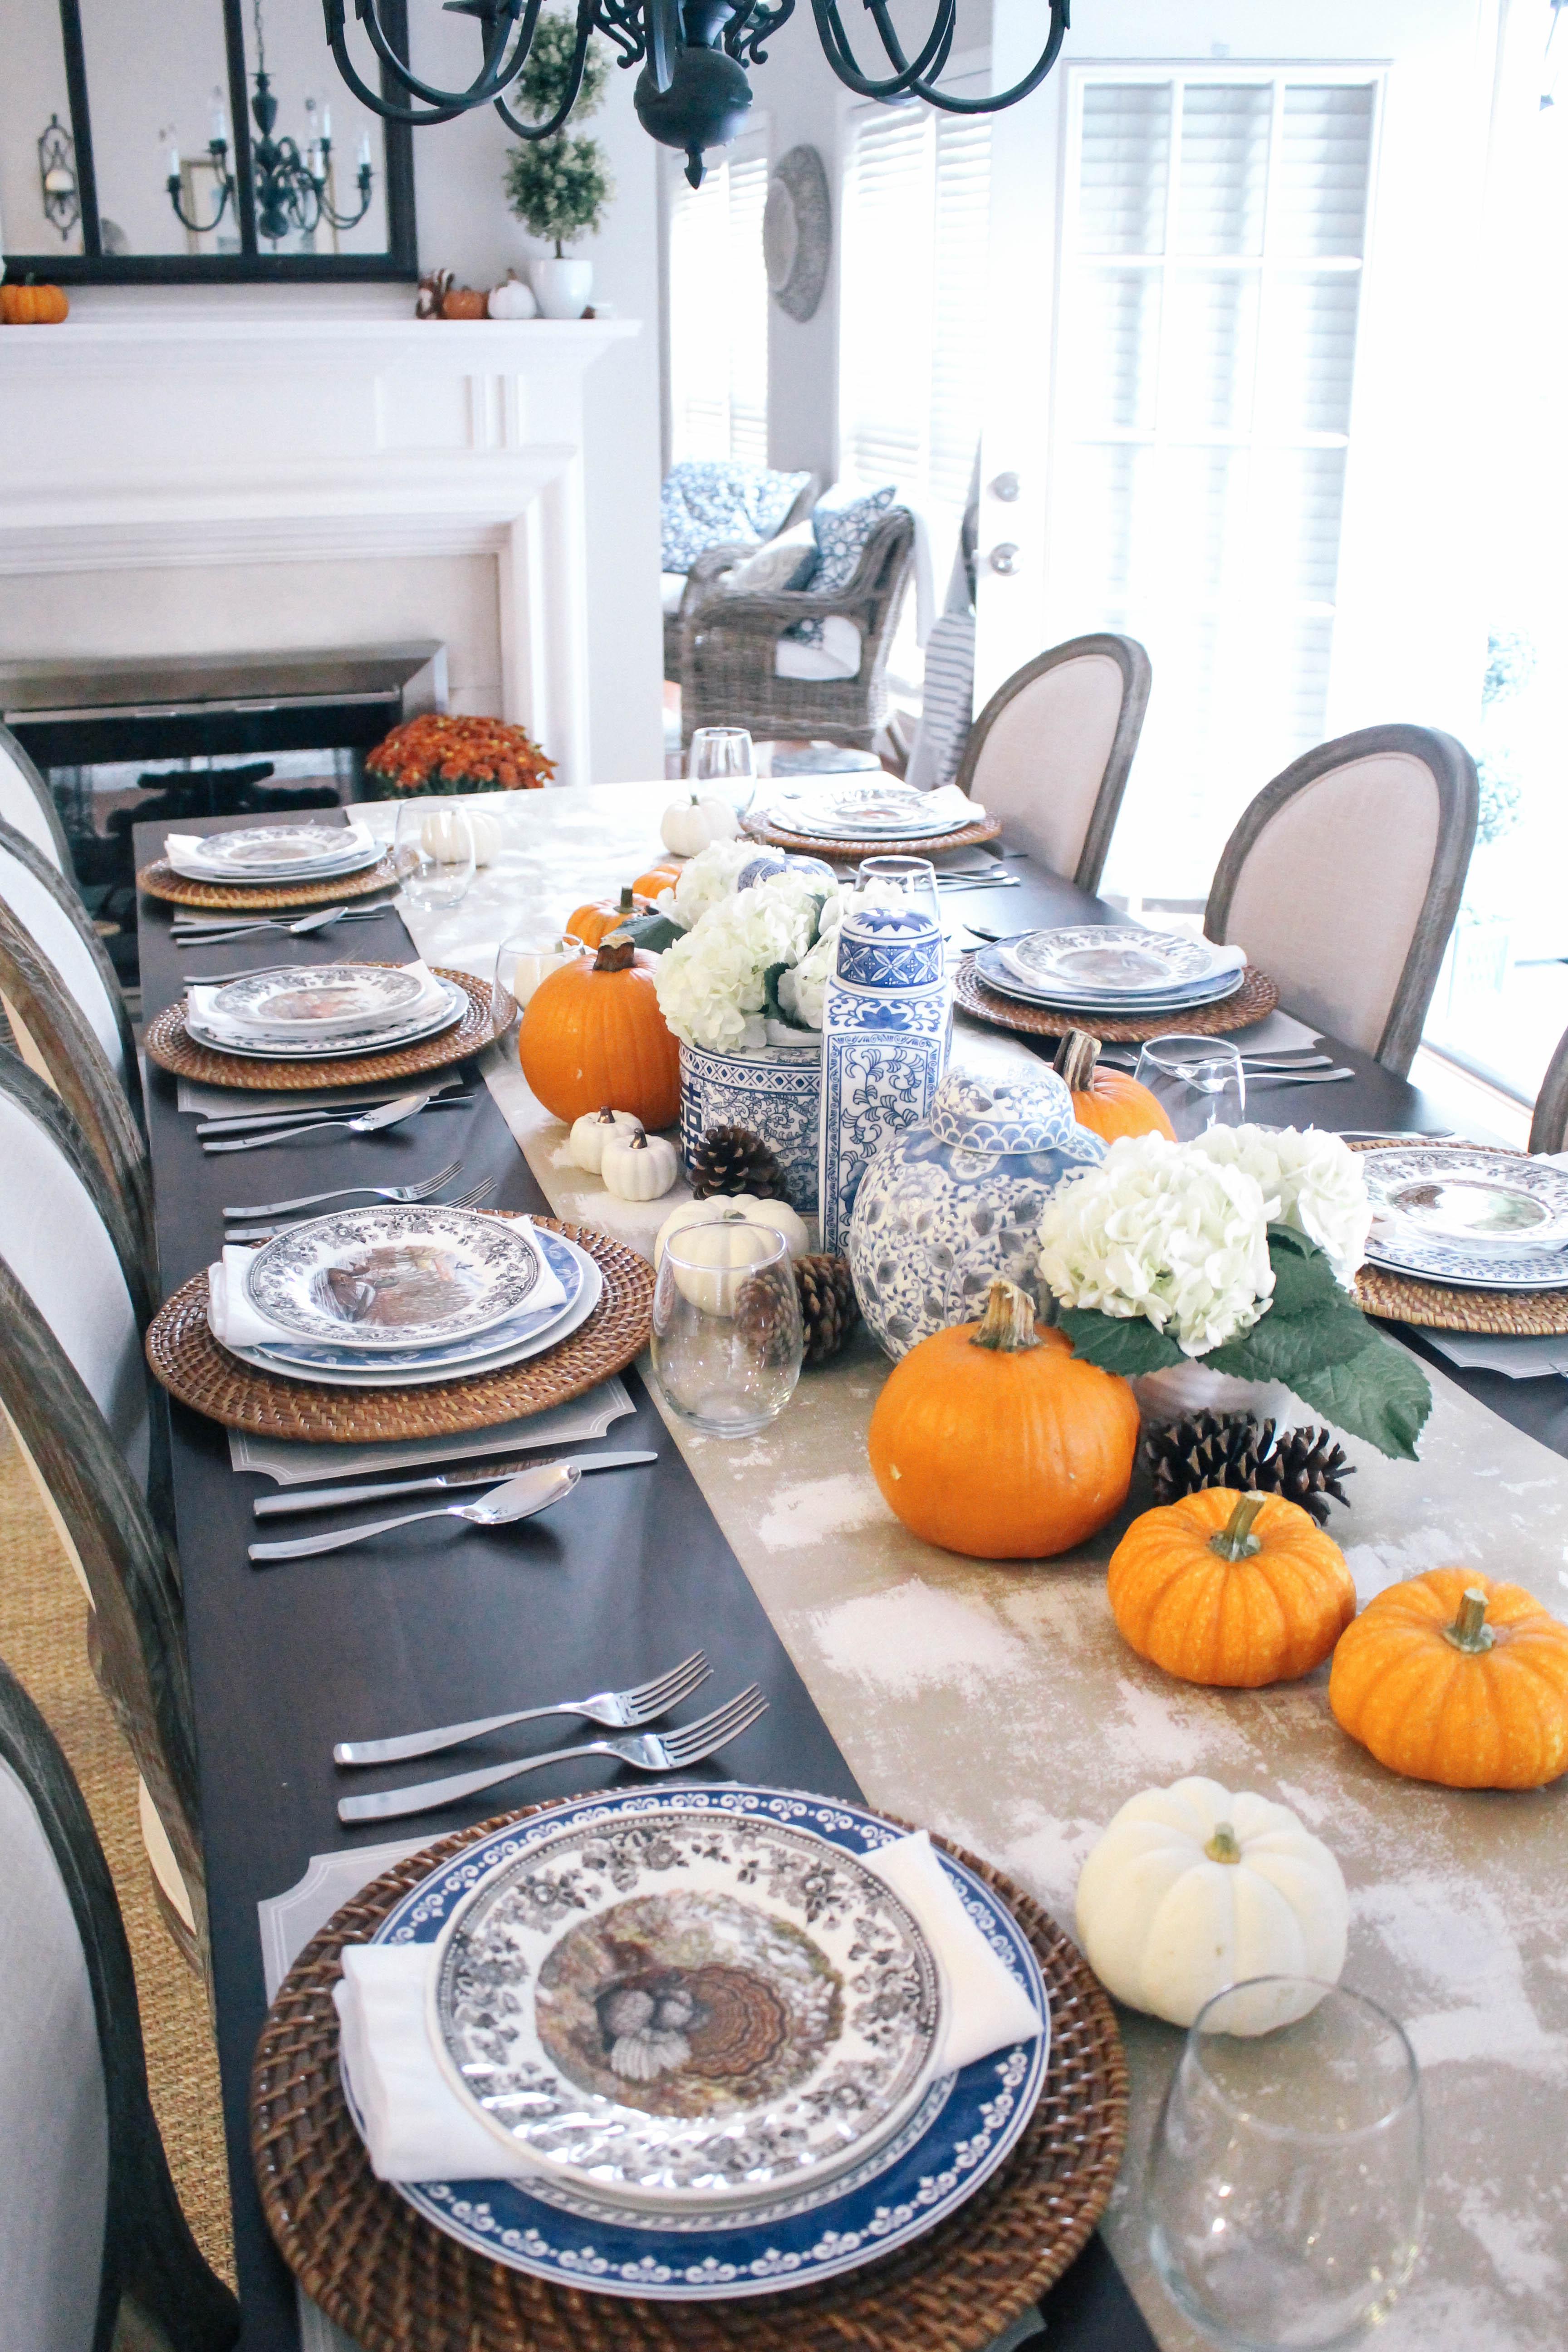 Thanksgiving-Tablescape-Ginger-Jars-Pumpkins-Blue-White-Orange-Animal-Game-Plate-China-6